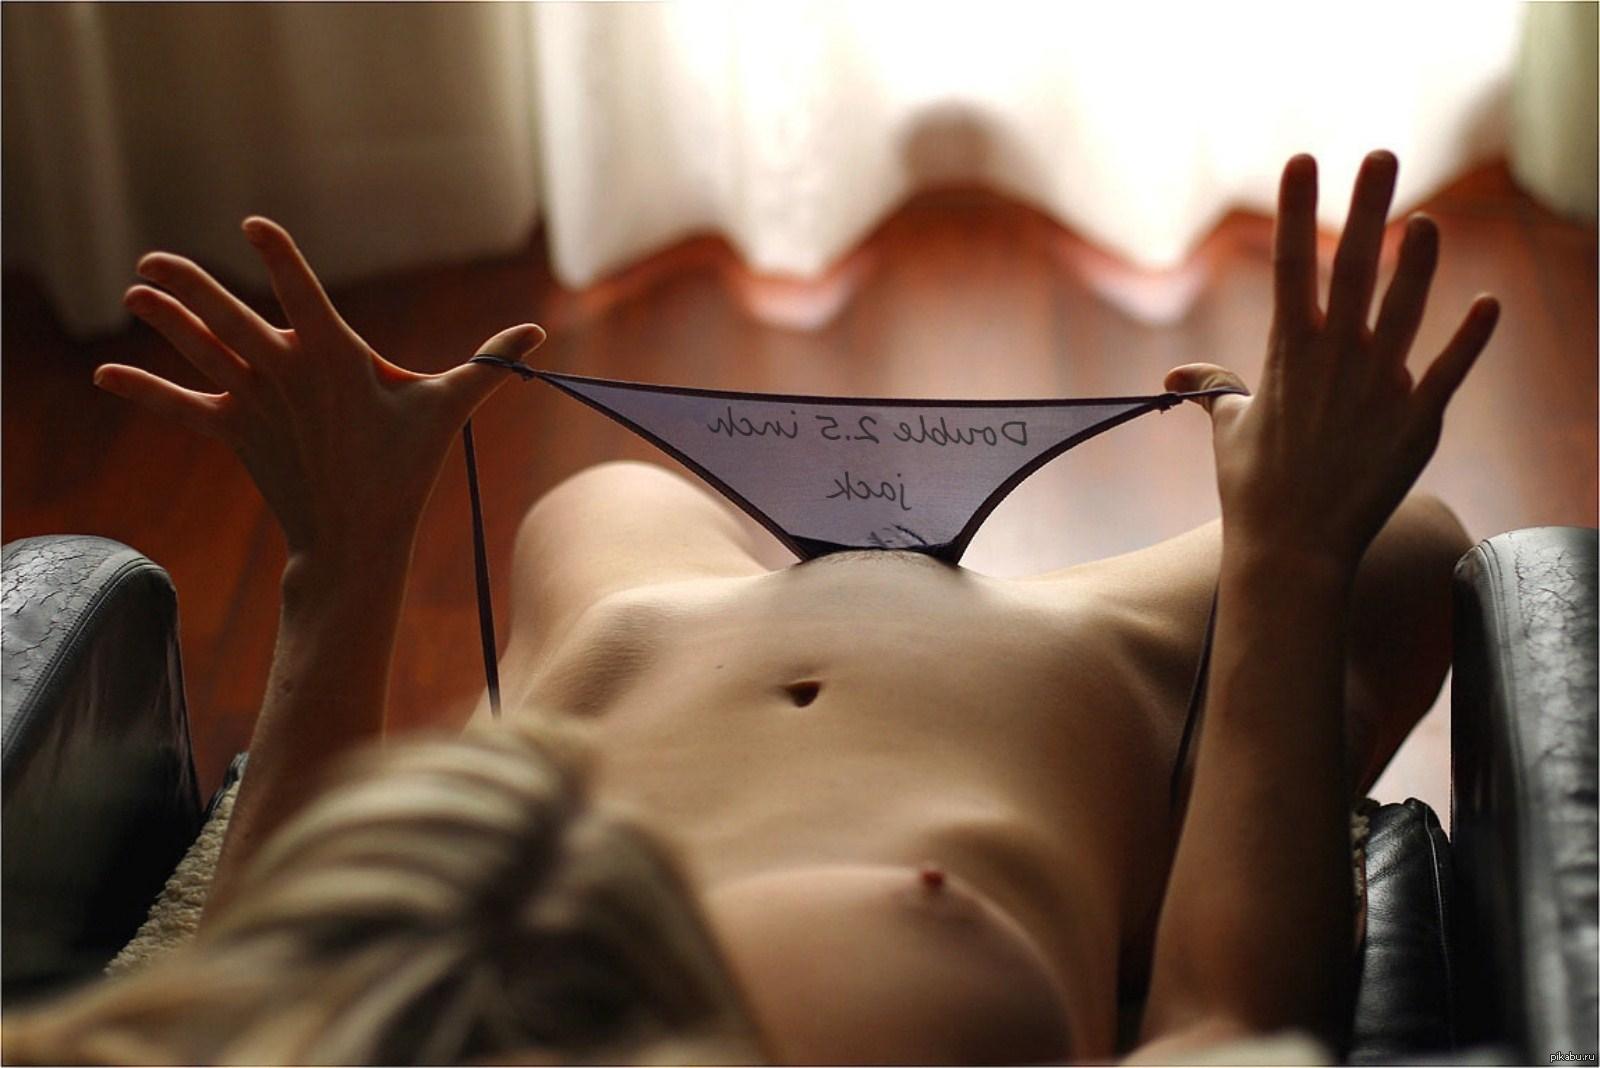 yahoo-erotic-greetings